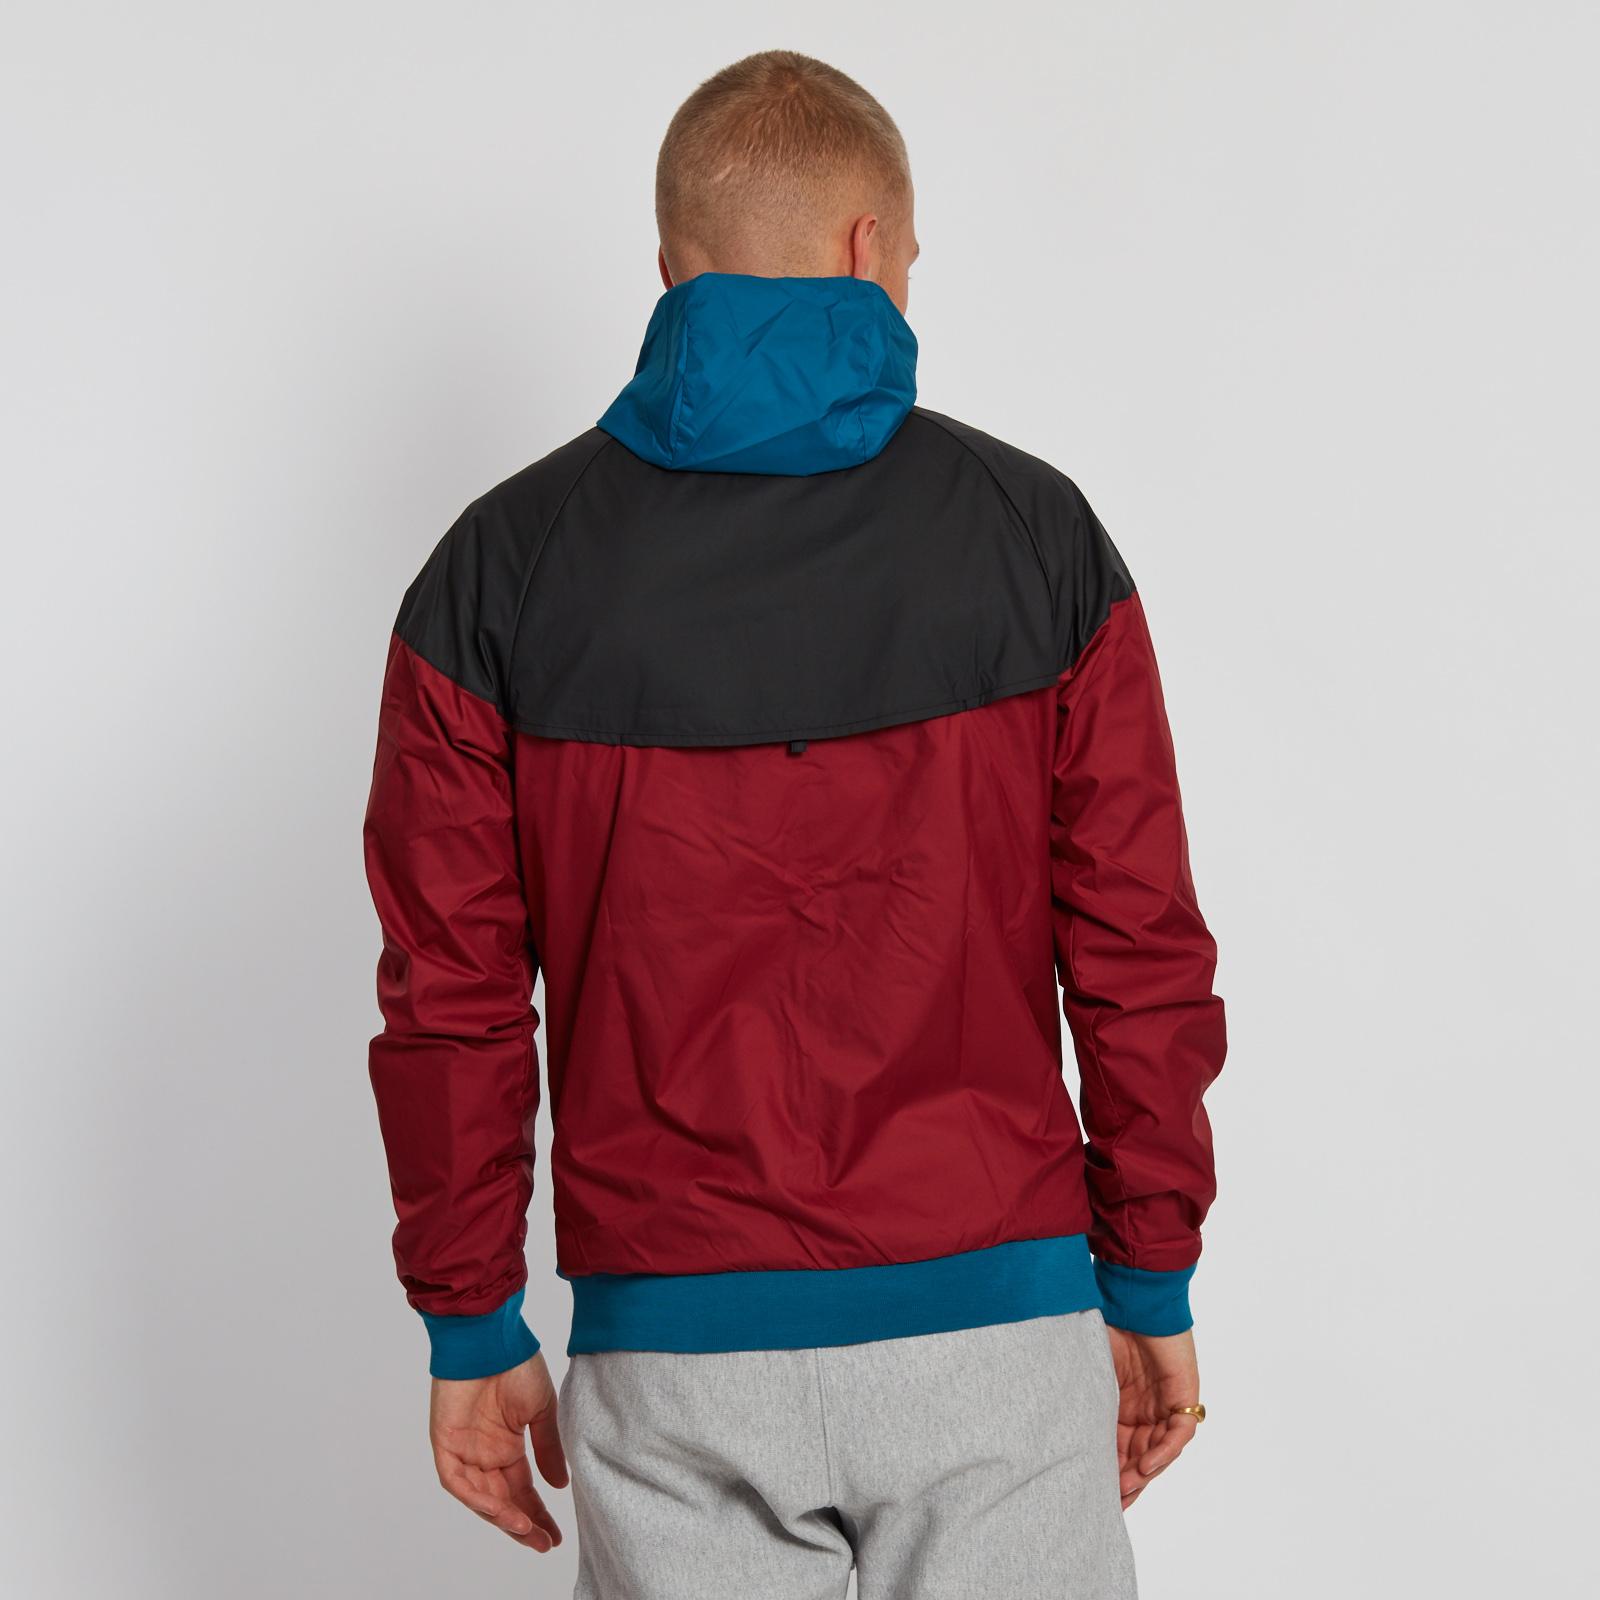 dceed658f Nike Nike Windrunner Jacket - 727324-301 - Sneakersnstuff | sneakers &  streetwear online since 1999